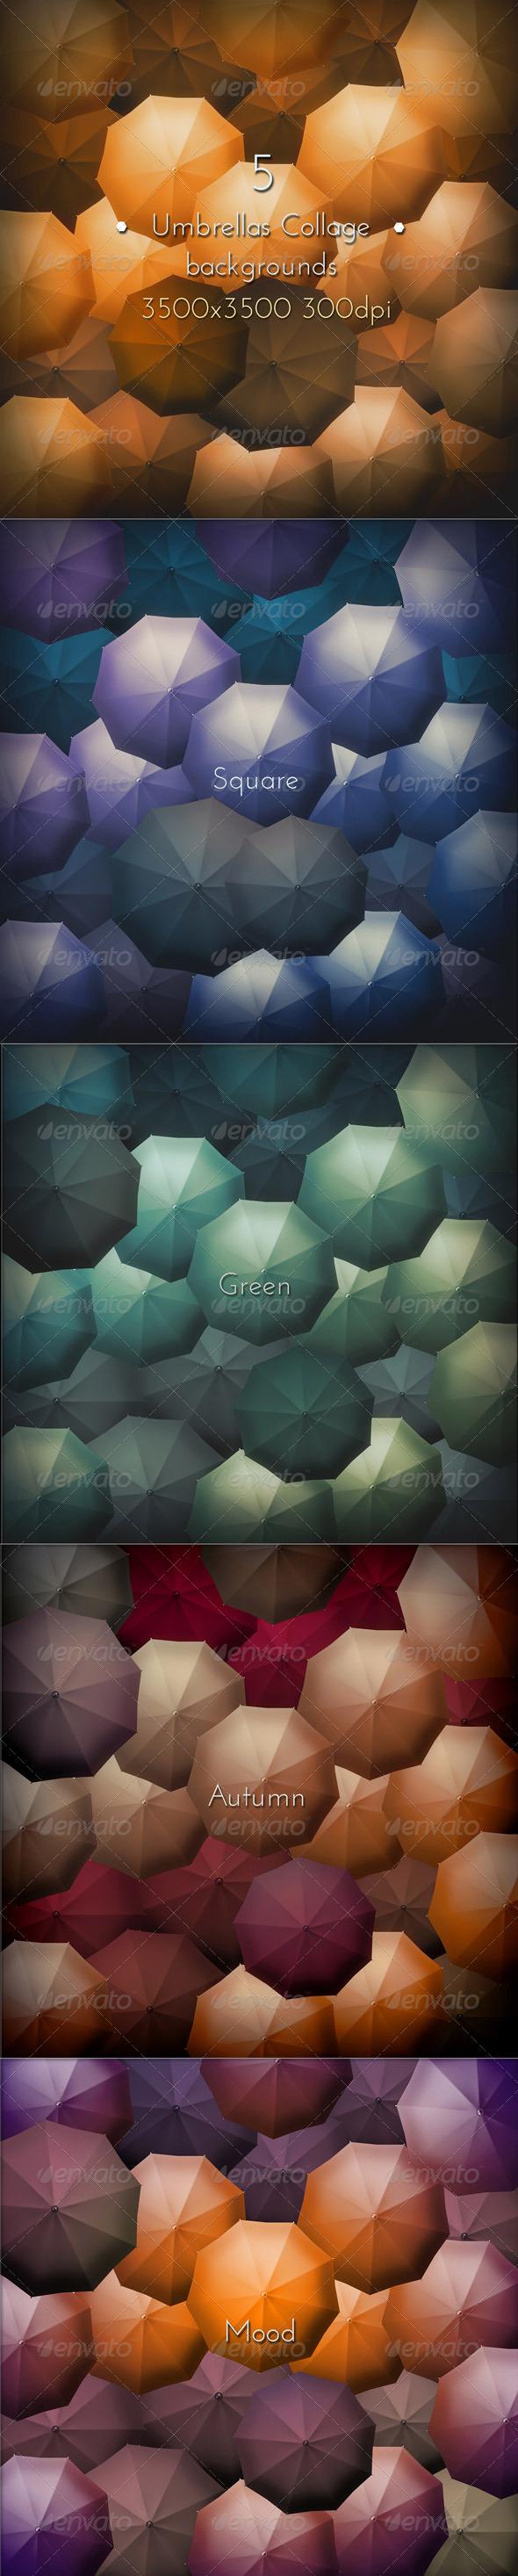 GraphicRiver Umbrellas Collage 8159923